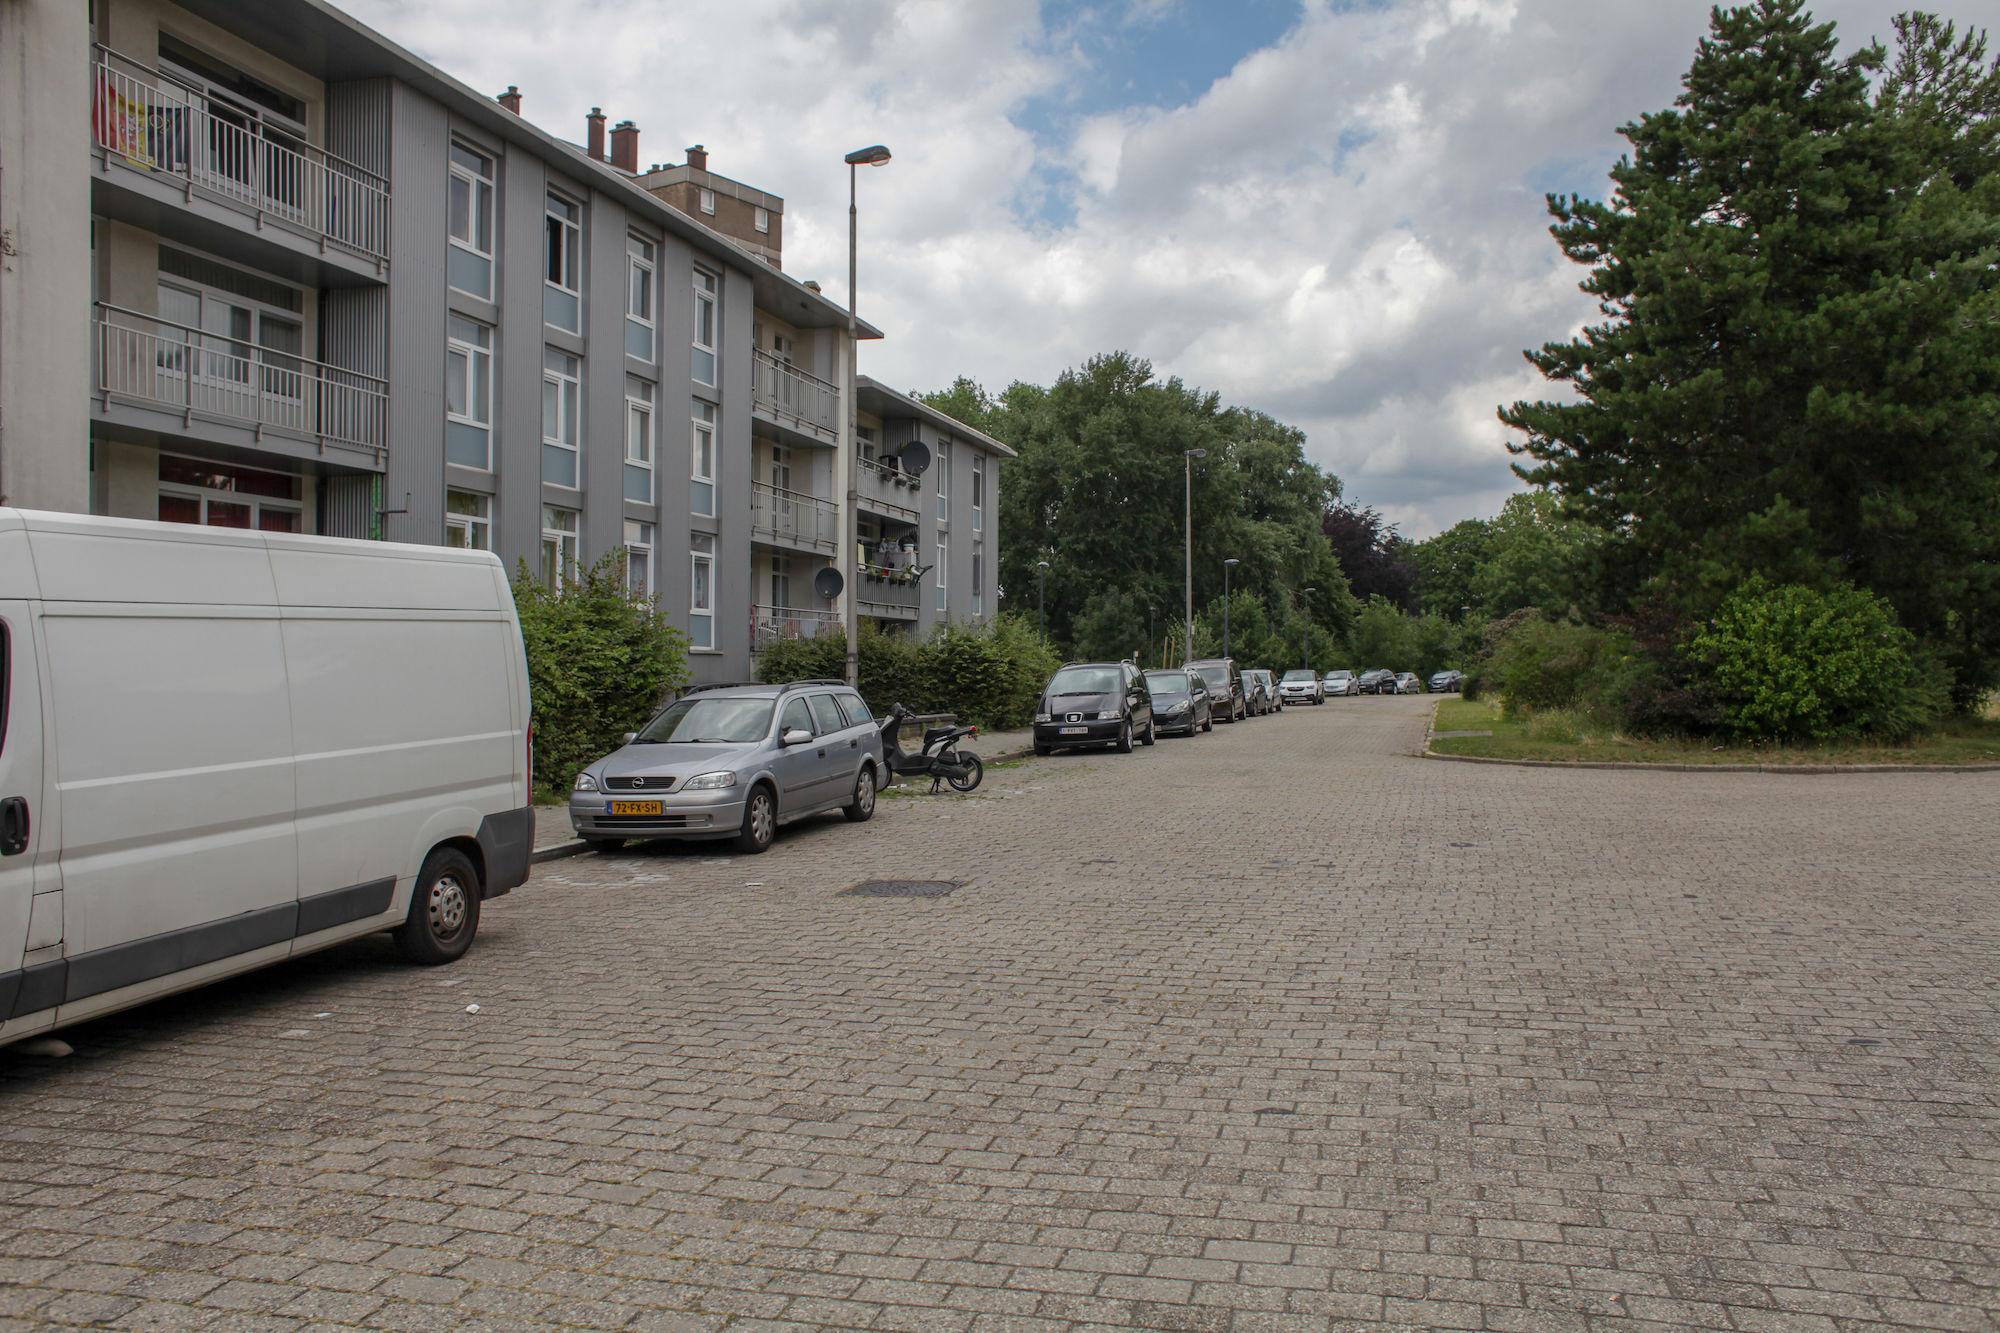 2019-07-02 Muide Meulestede prospectie Wannes_stadsvernieuwing_IMG_0345-3.jpg